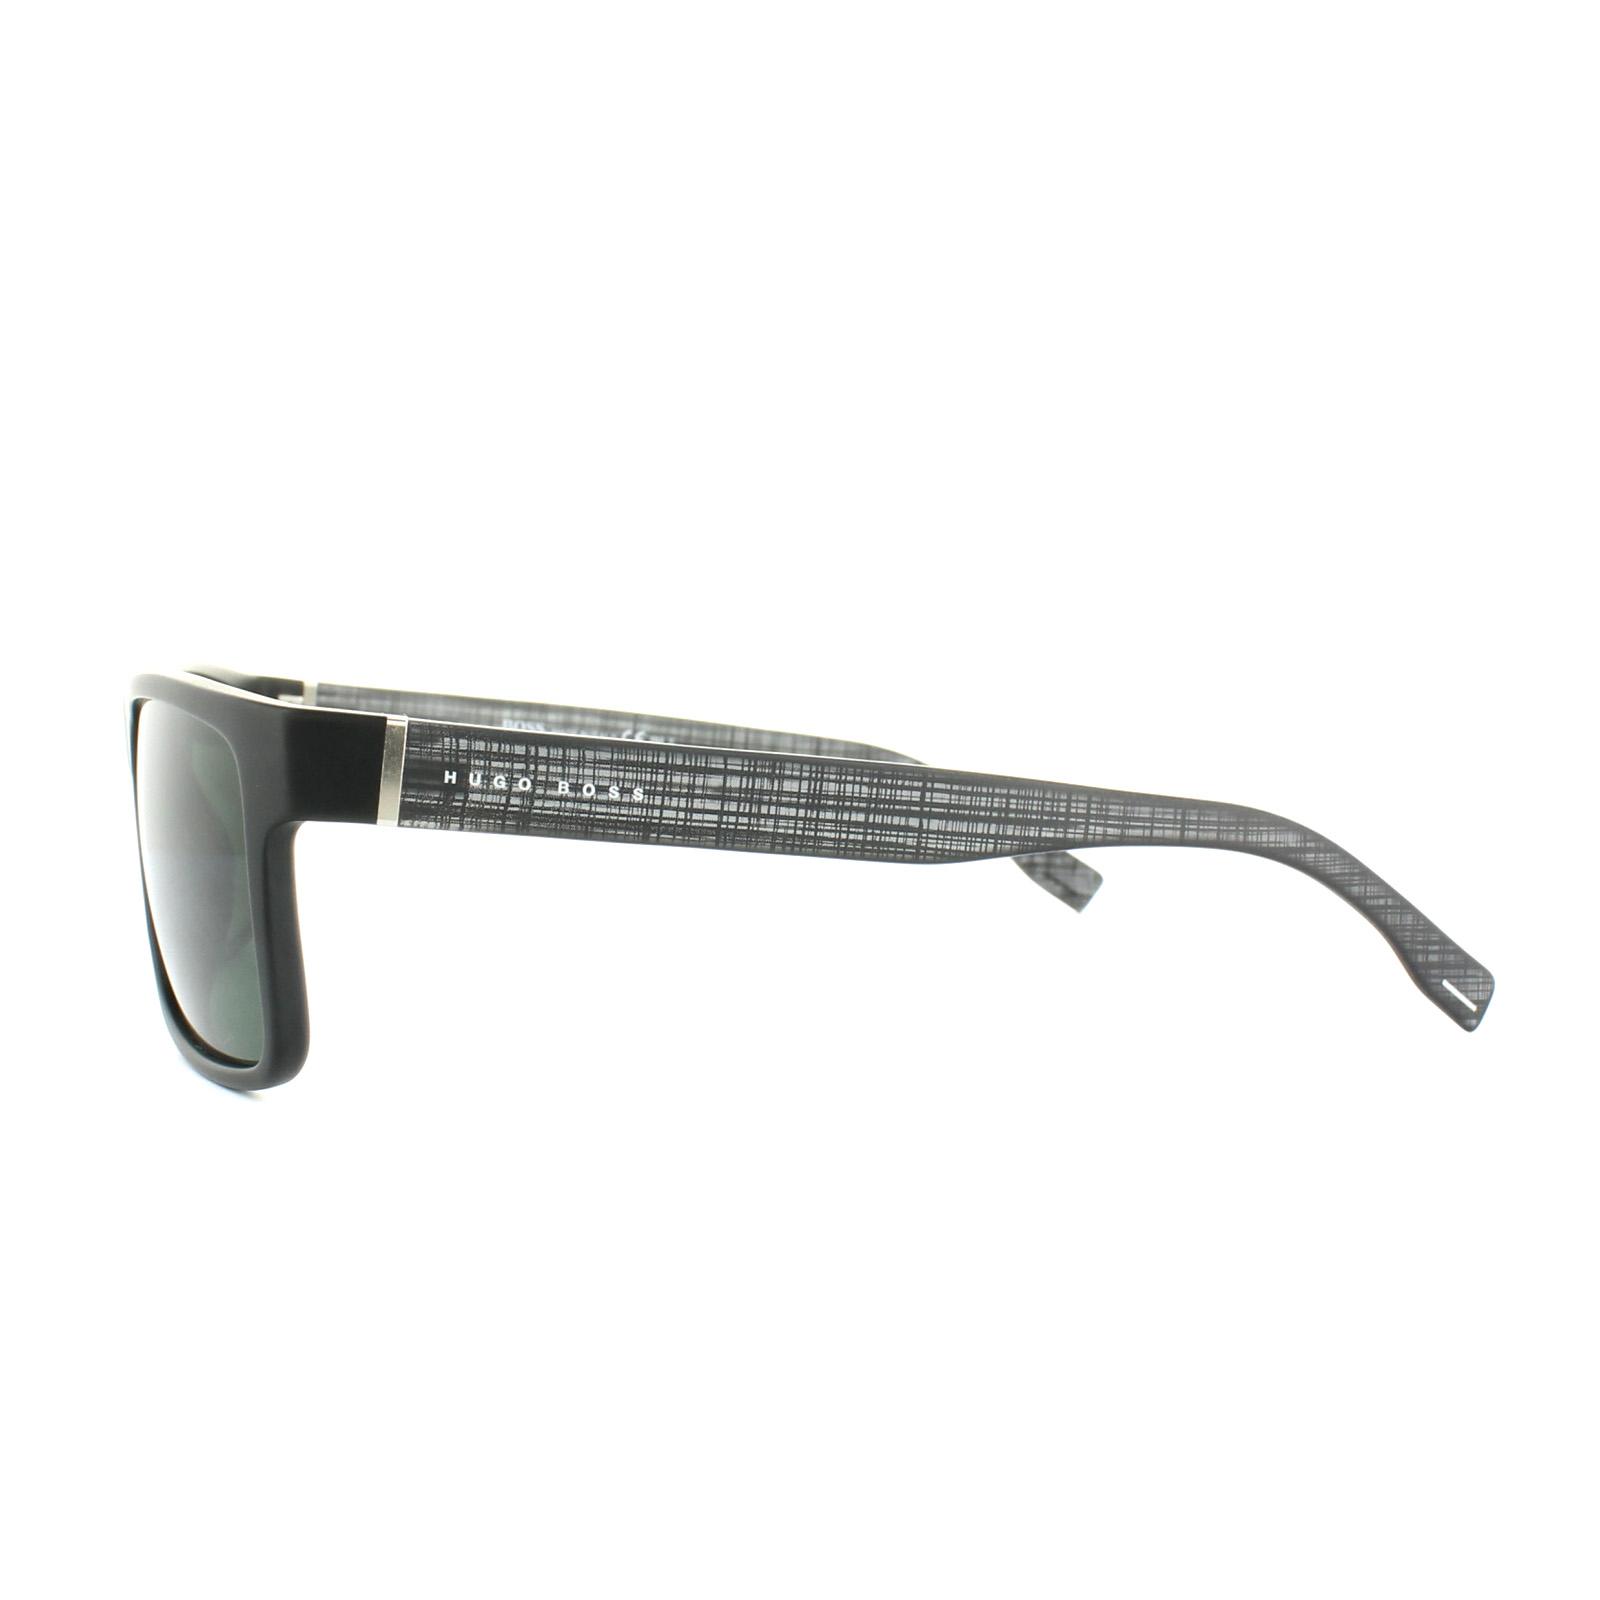 724fde4022773 Hugo Boss Sunglasses 0768 QNX 85 Black Grey Green 762753593160